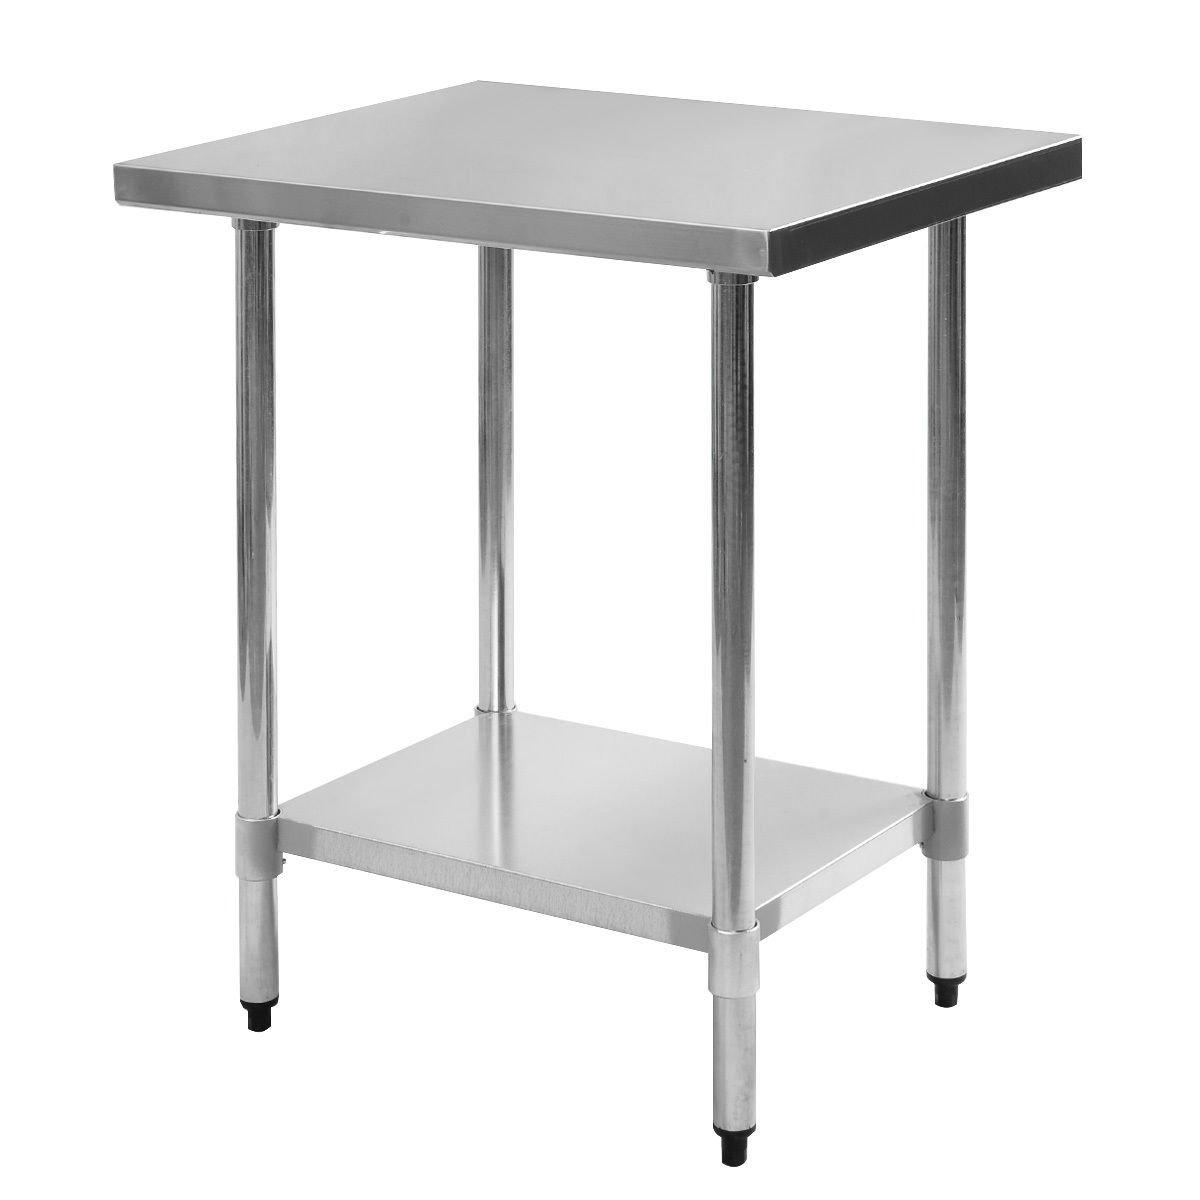 Giantex Stainless Steel Work Prep Table Commercial Kitchen Restaurant (24'' x 30'' )